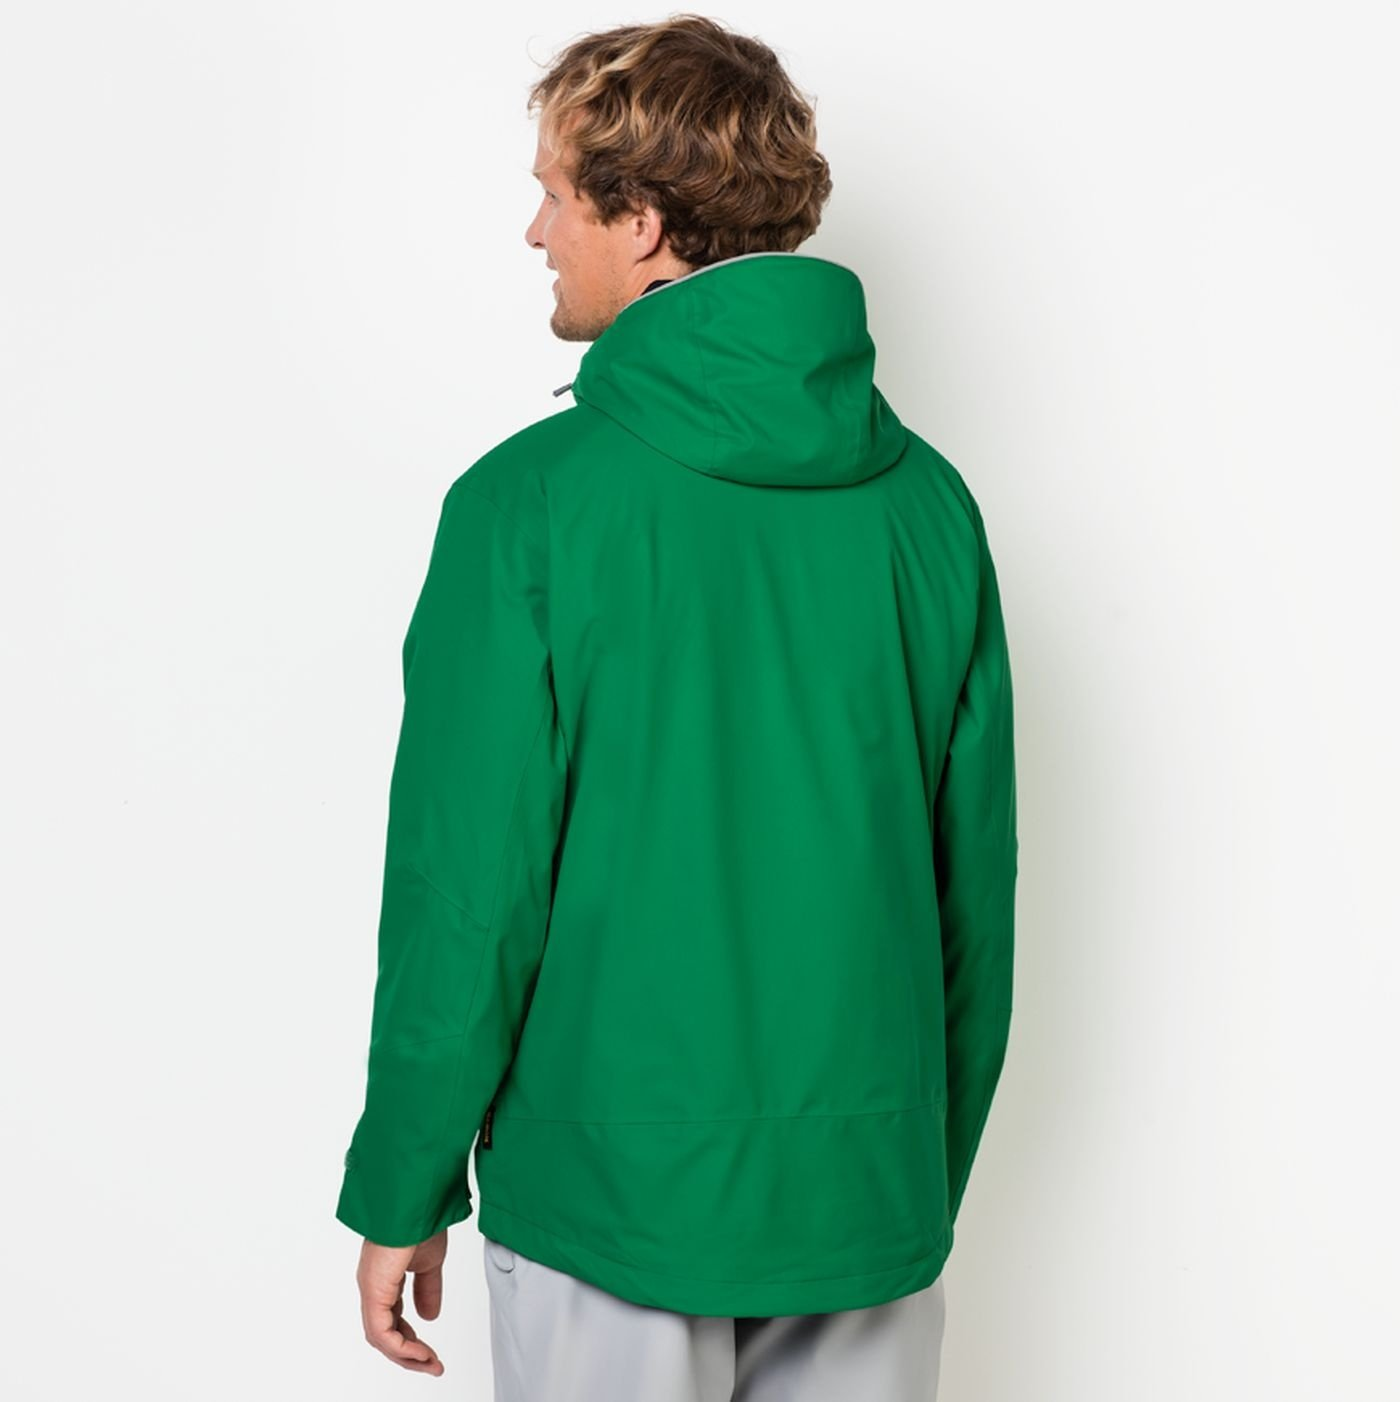 80454545ea2 Jack Wolfskin Men's 3in1 Jacket Vermillion Pass Men, Men, Forest Green,  XX-Large: Amazon.co.uk: Sports & Outdoors